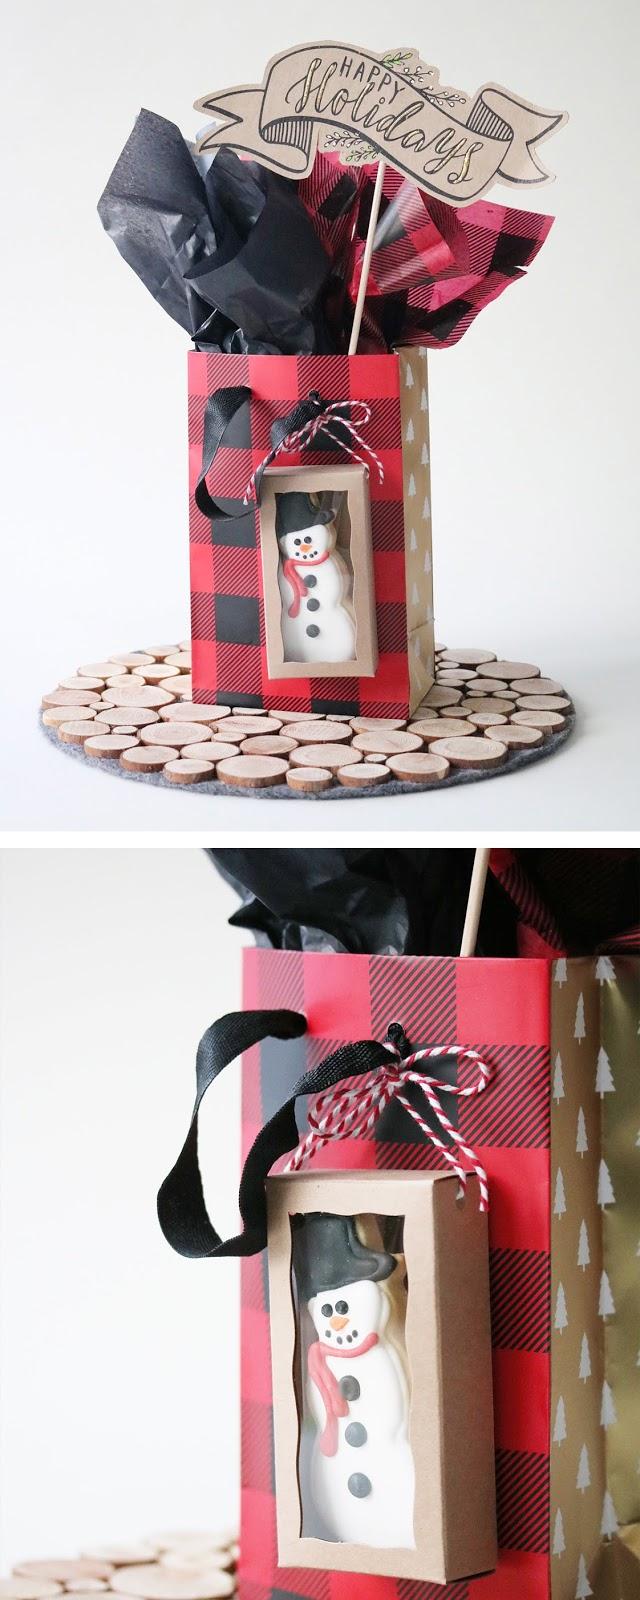 edible gift topper inspiration for holiday gift wrapping | Creative Bag and Bake Sale Toronto